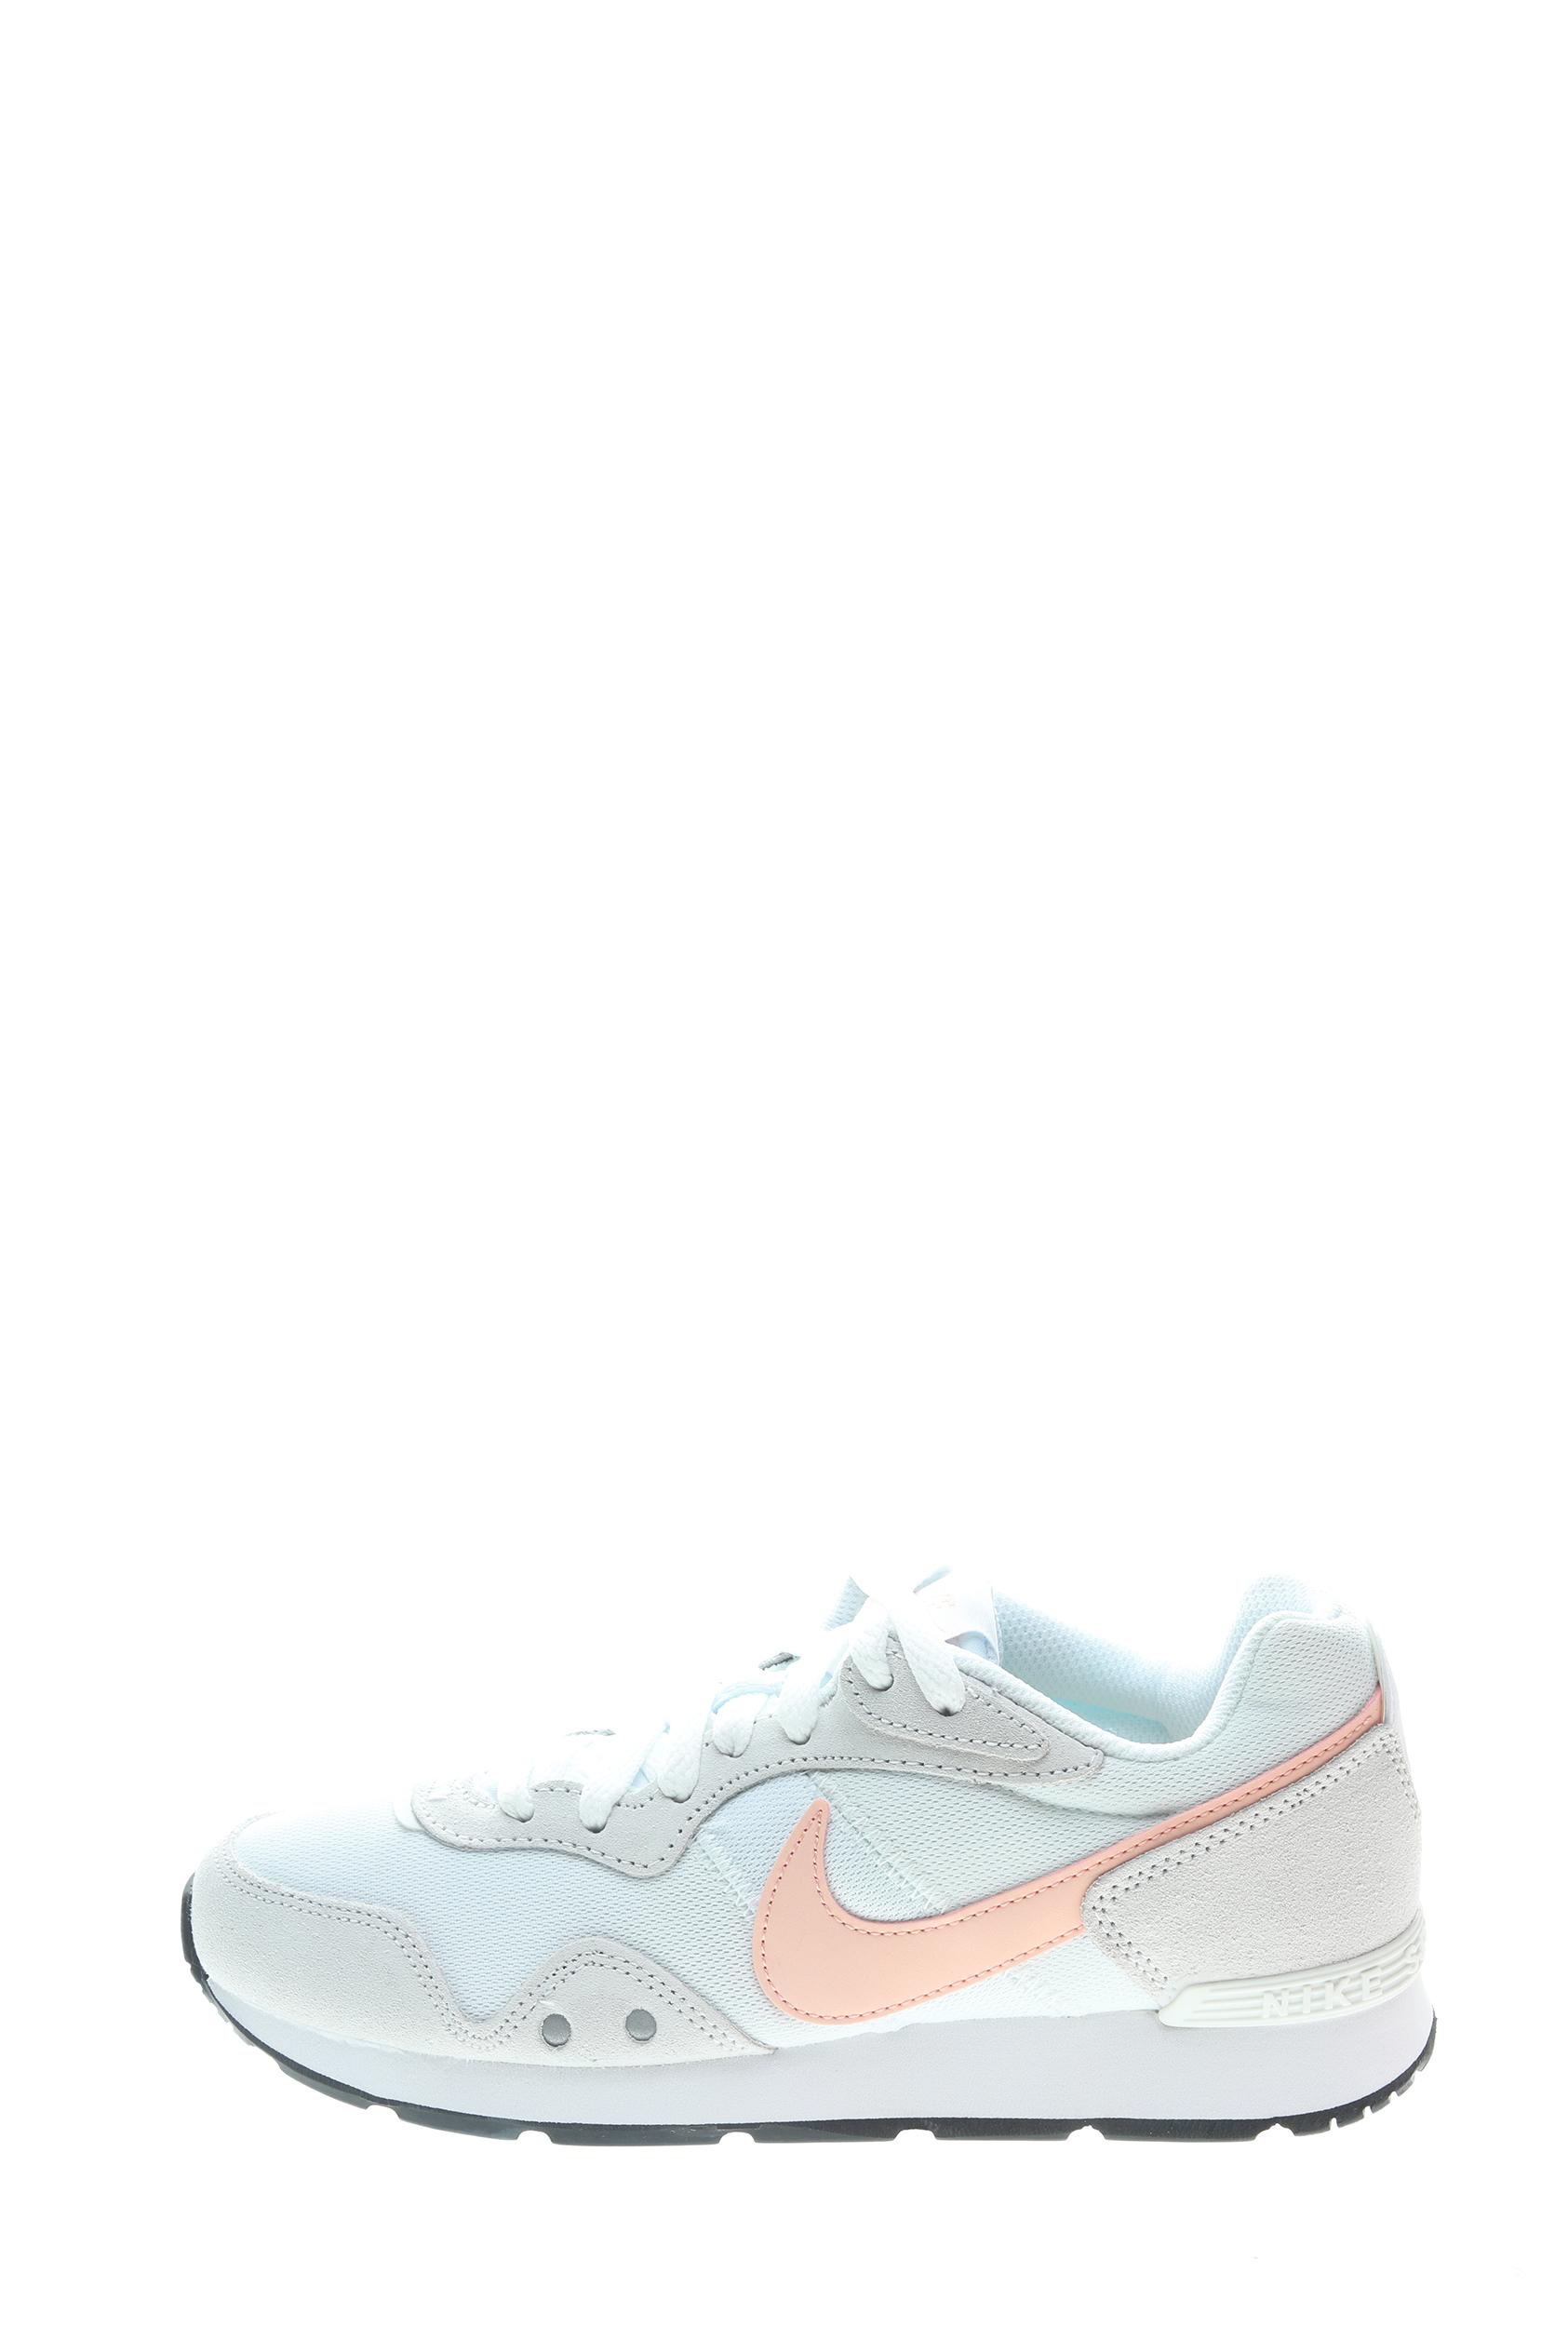 NIKE – Γυναικείο παπούτσι NIKE VENTURE RUNNER λευκό